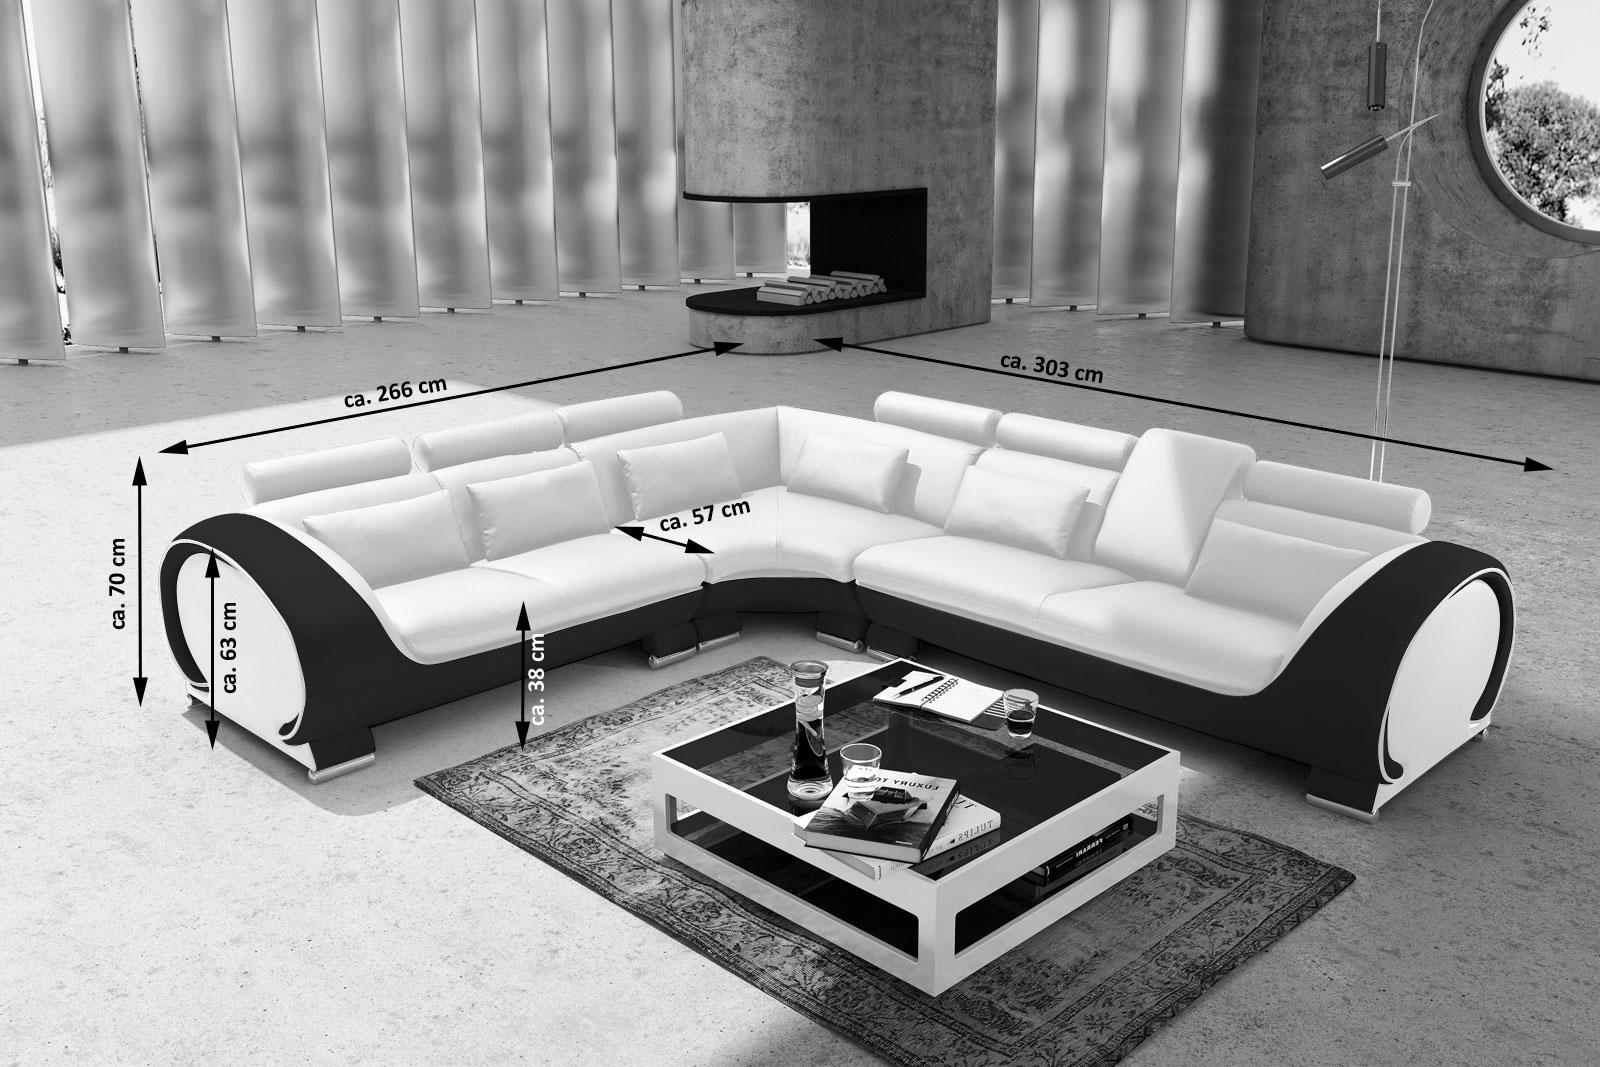 sam ecksofa wei schwarz couch 266 x 303 cm vigo combi 4. Black Bedroom Furniture Sets. Home Design Ideas